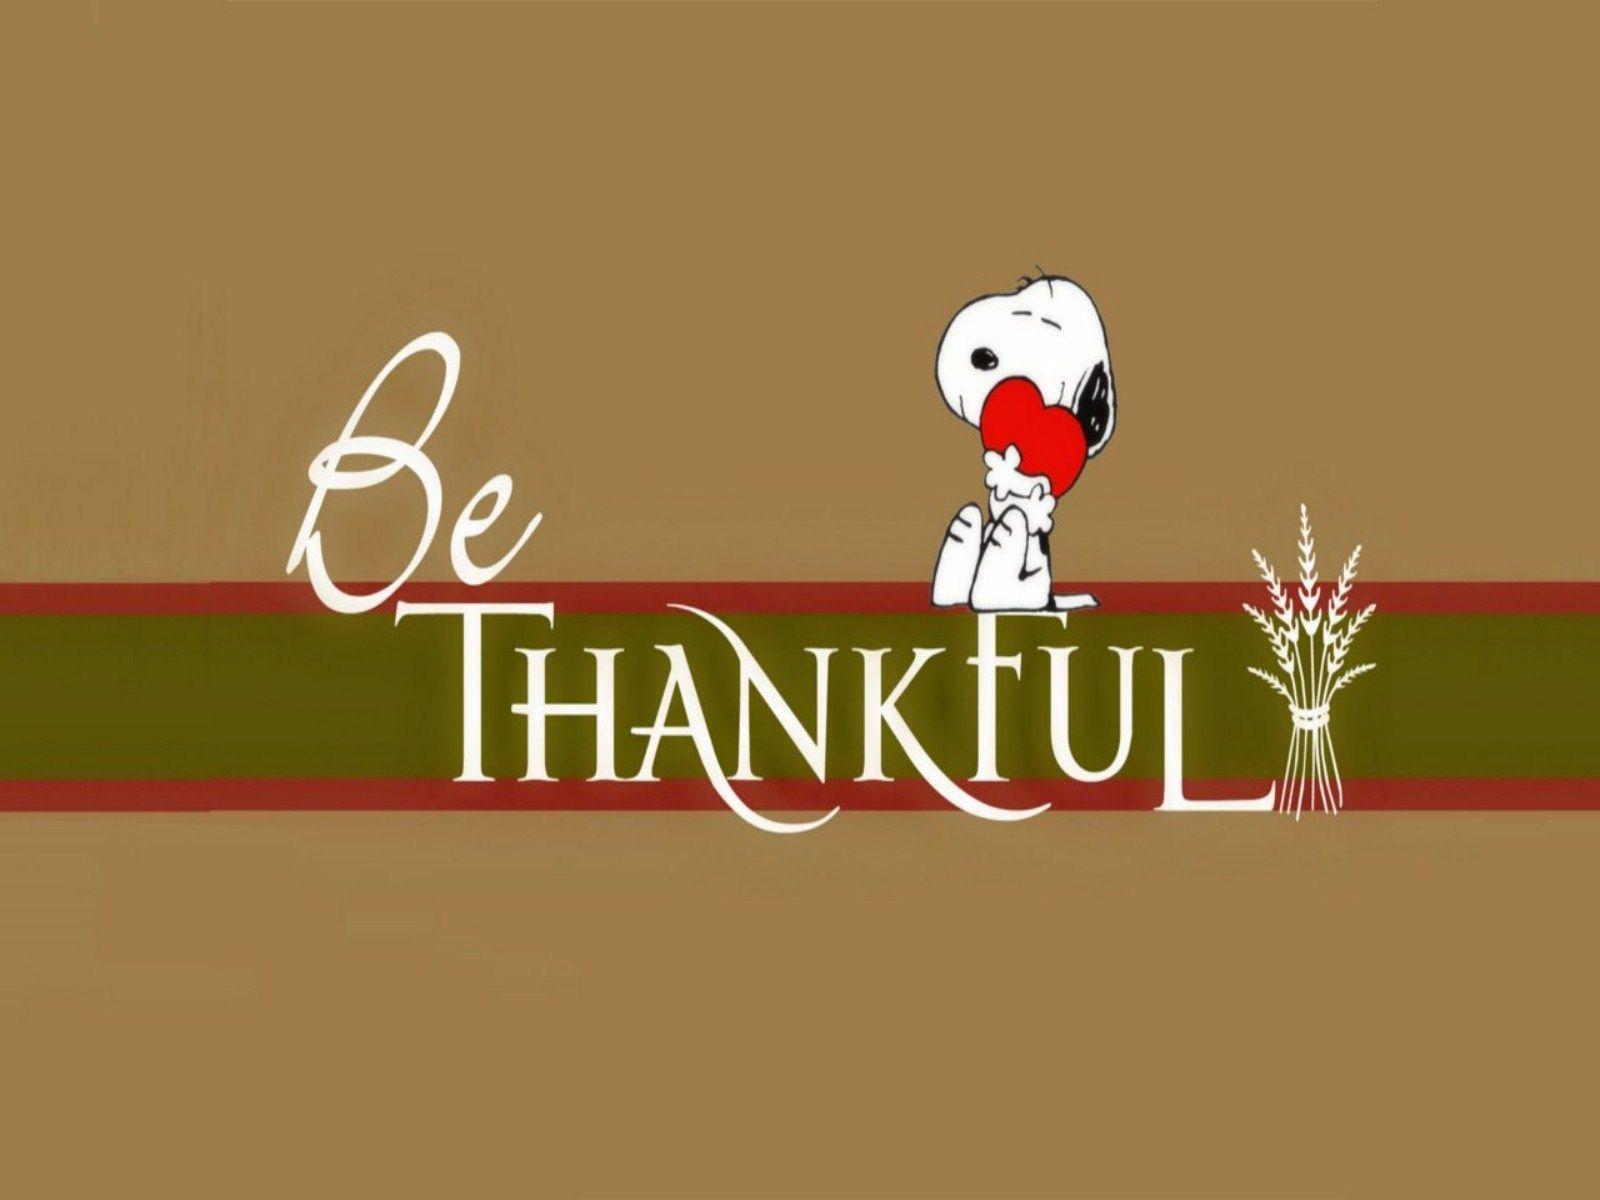 Most Inspiring Wallpaper High Resolution Thanksgiving - 4e773dbf63b257cc2ade5a51a6a00154  Graphic_204635.jpg